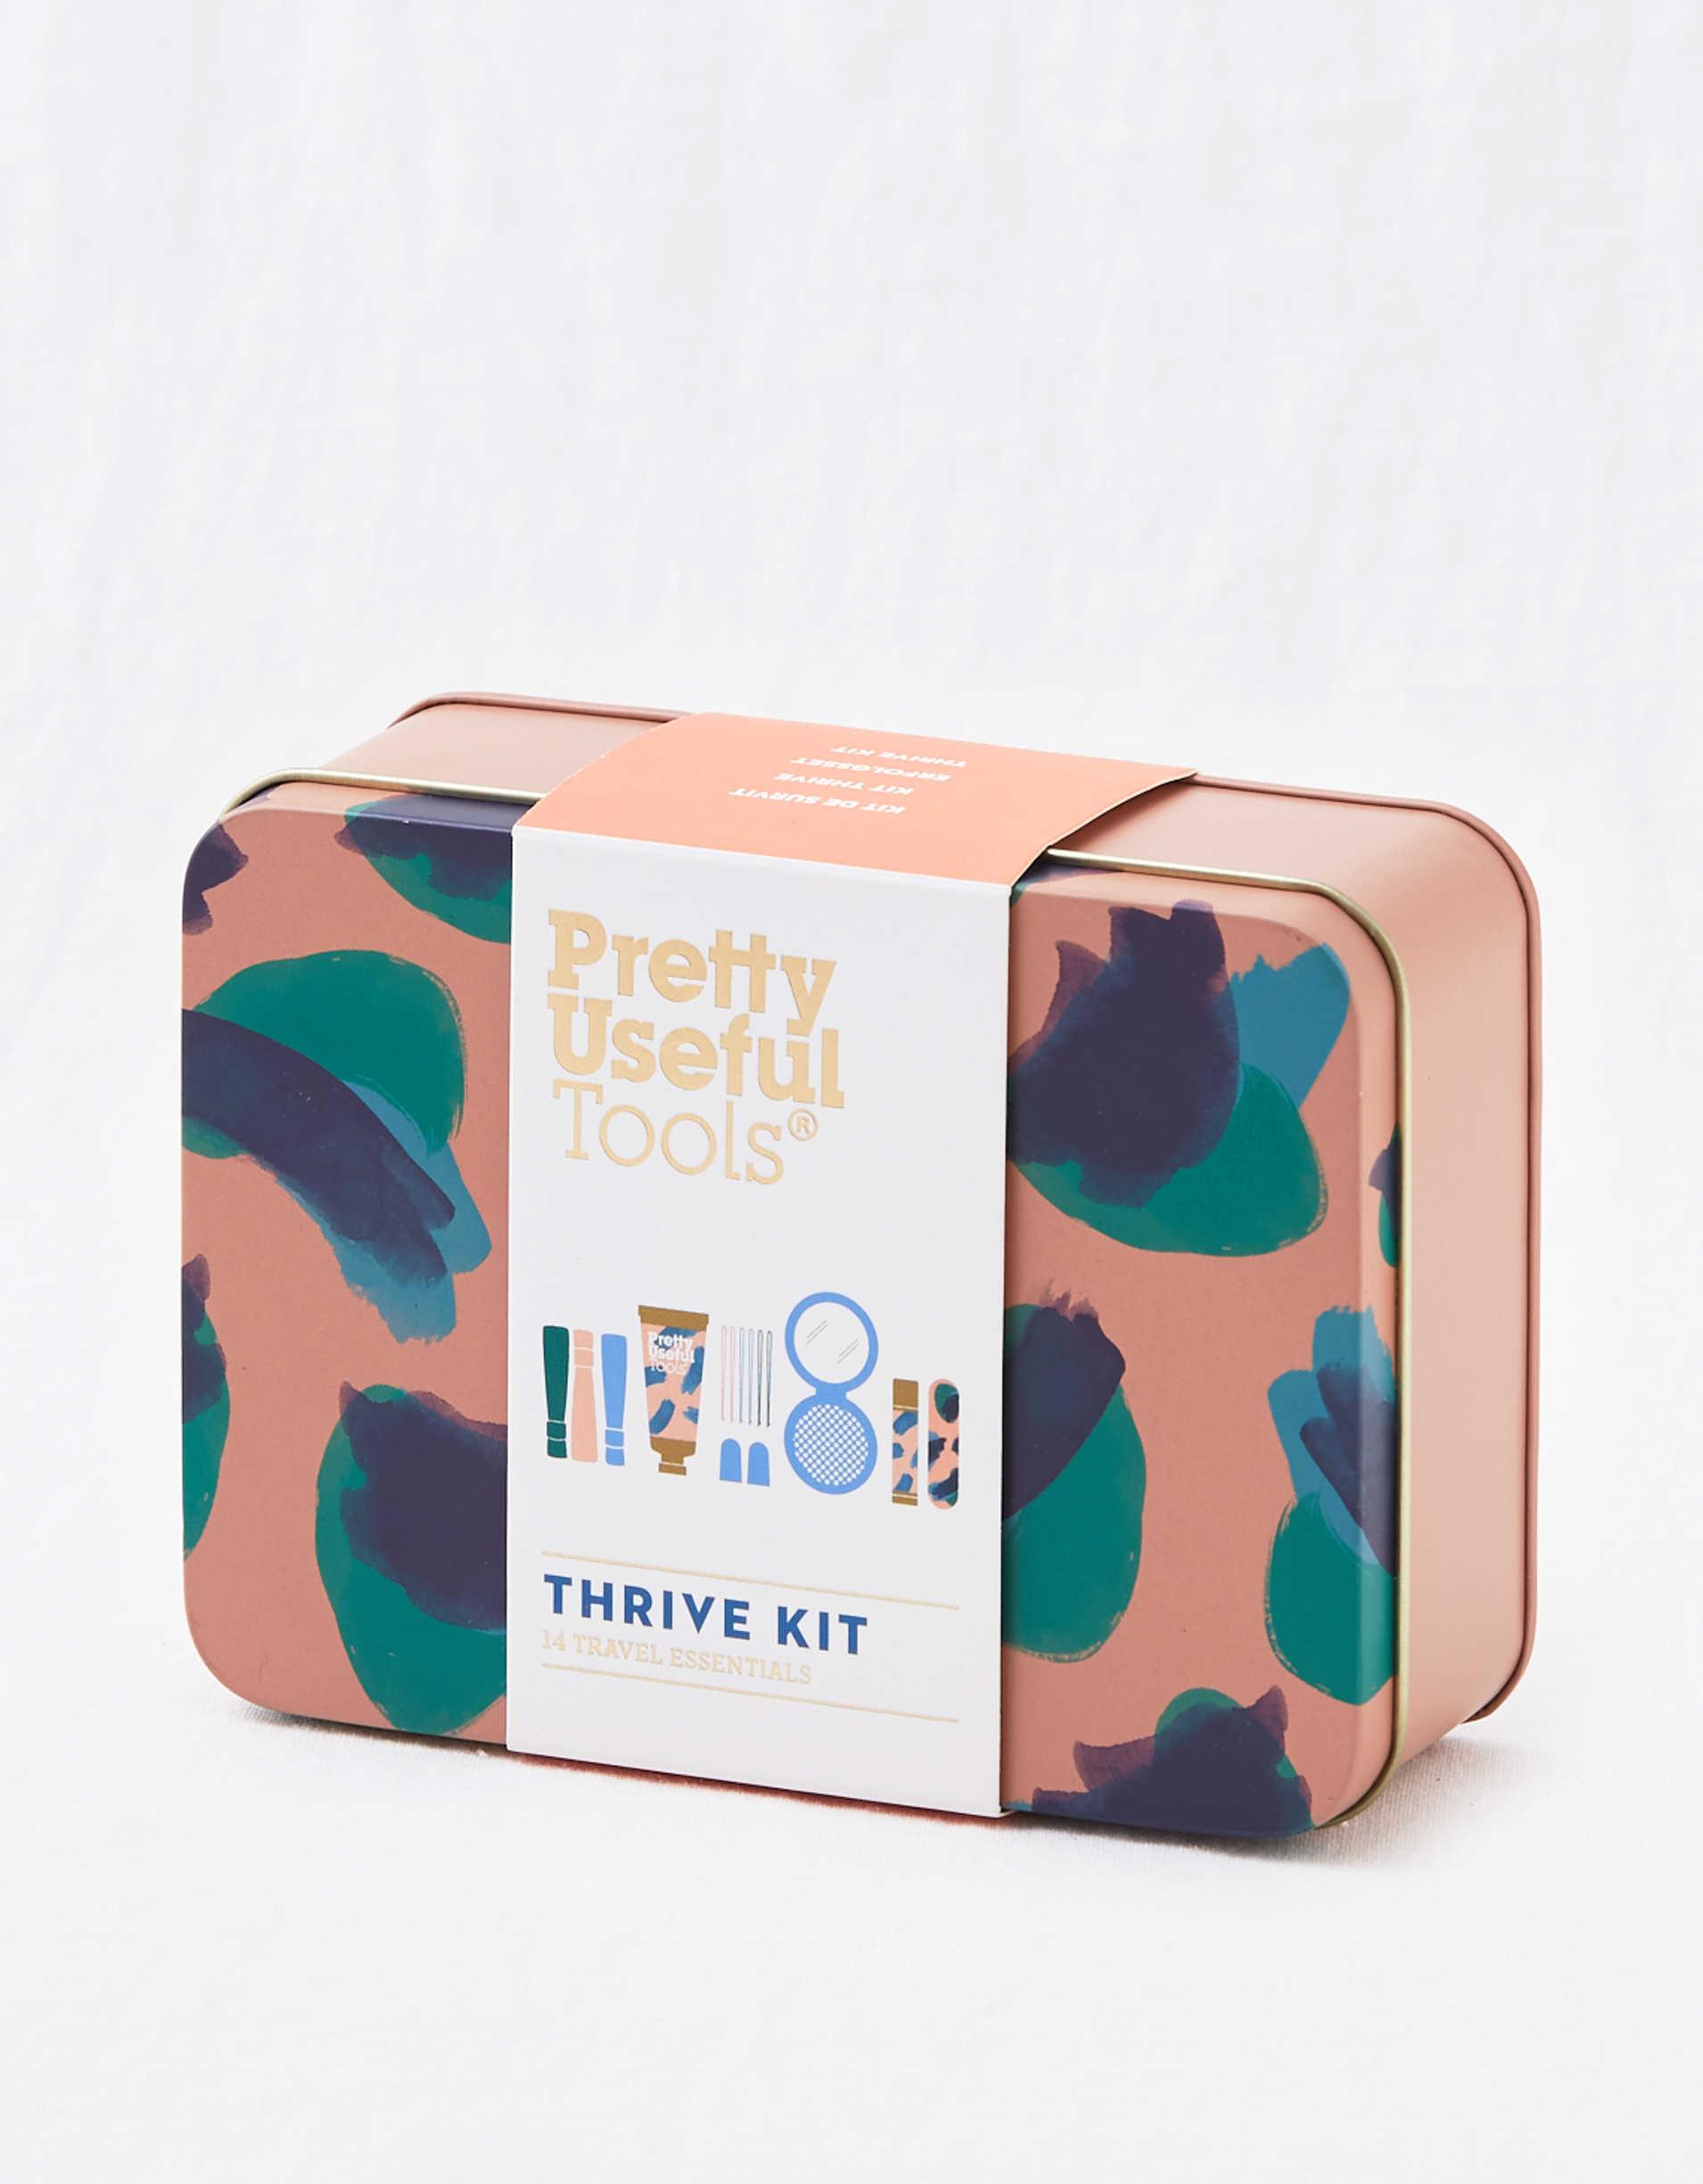 Pretty And Useful : pretty useful tools thrive kit ~ Watch28wear.com Haus und Dekorationen